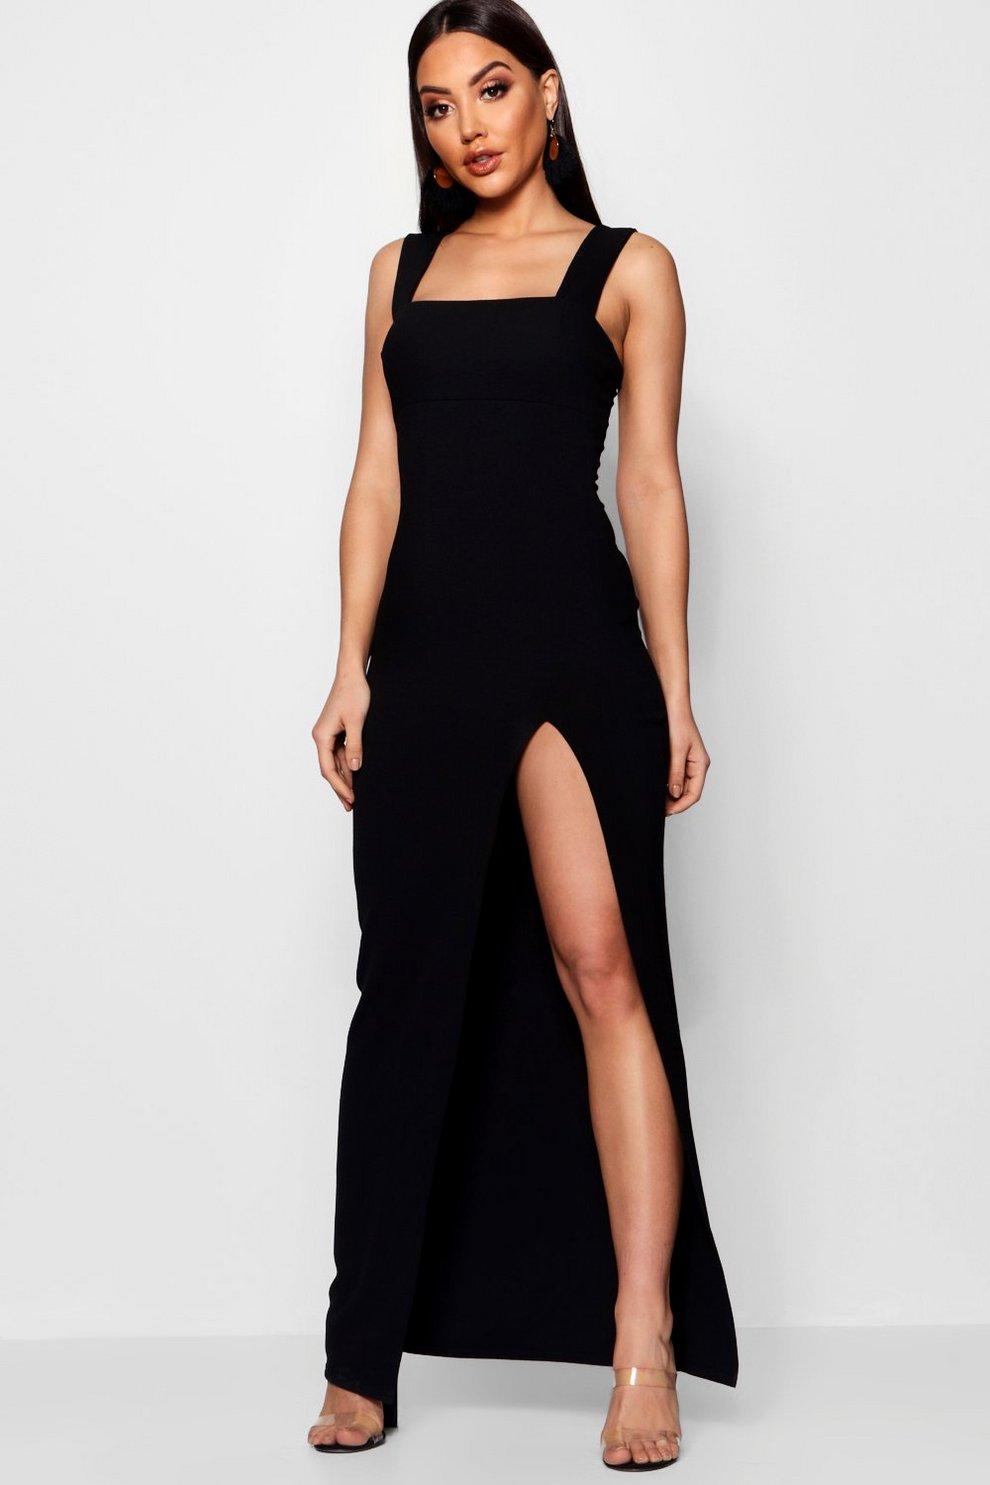 bdabd816572bb Womens Black Square Neck Tie Side Split Maxi Dress